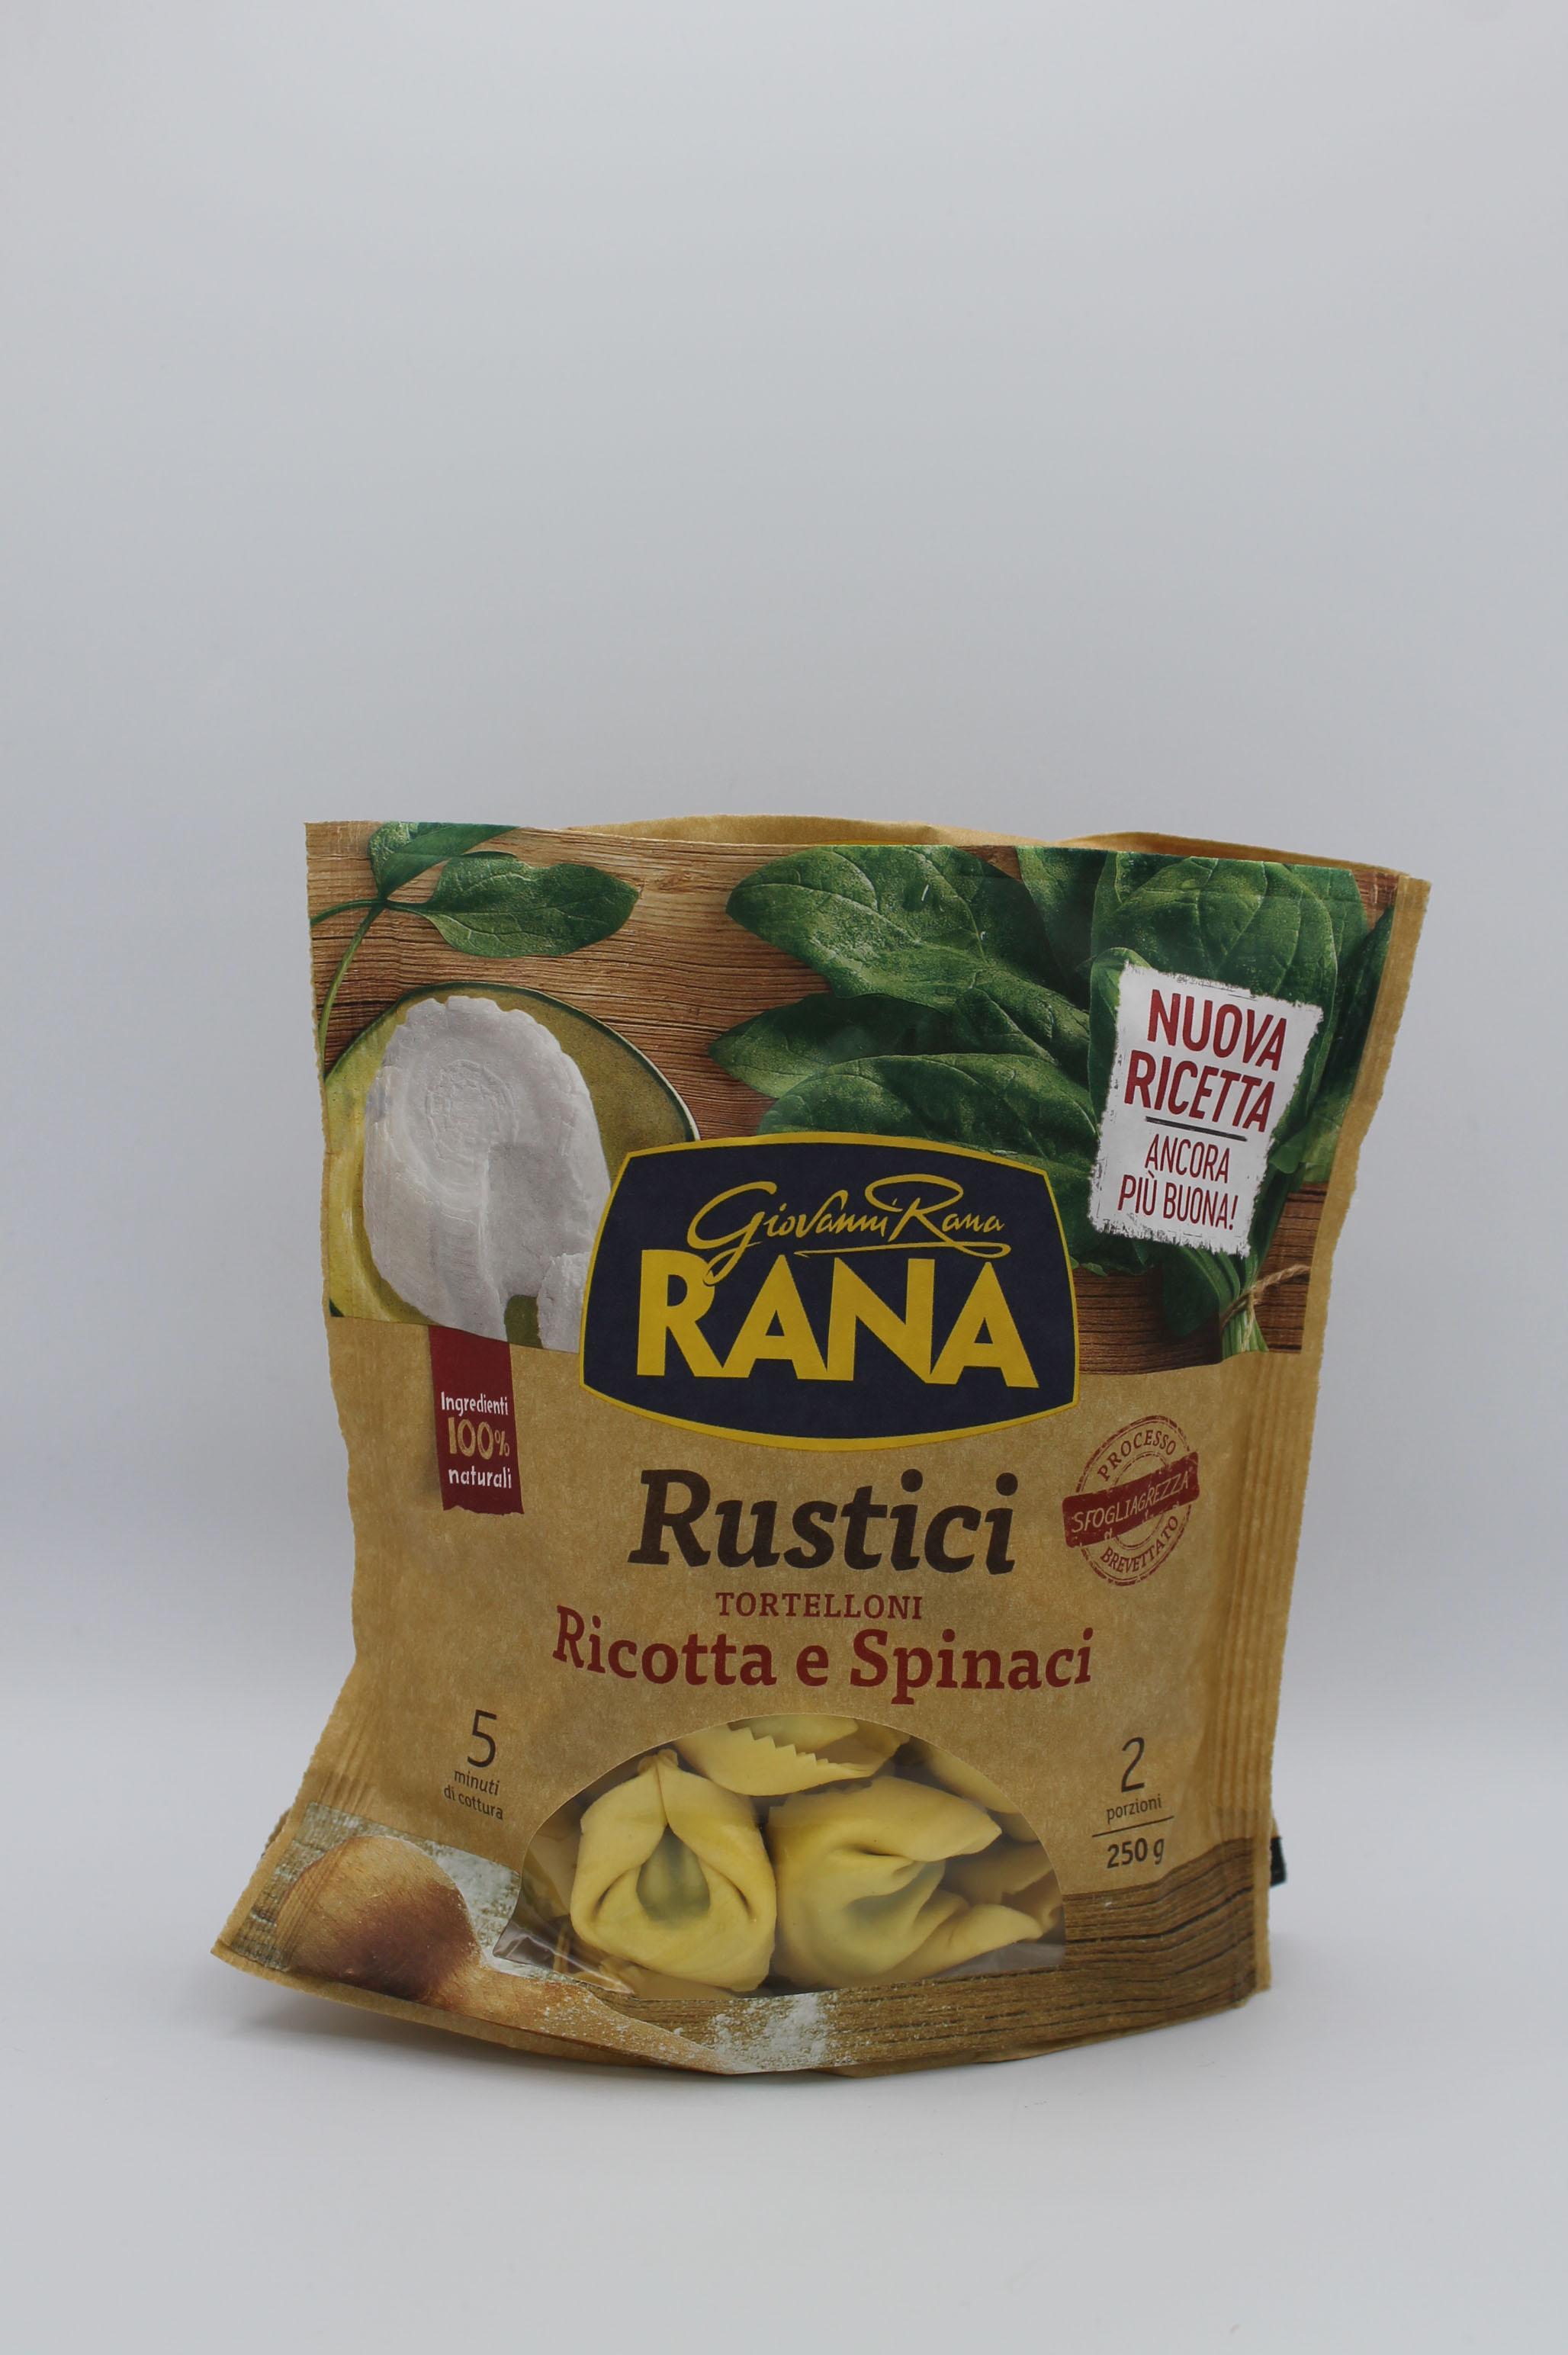 Rana tortelloni ricotta/spinaci 250gr.